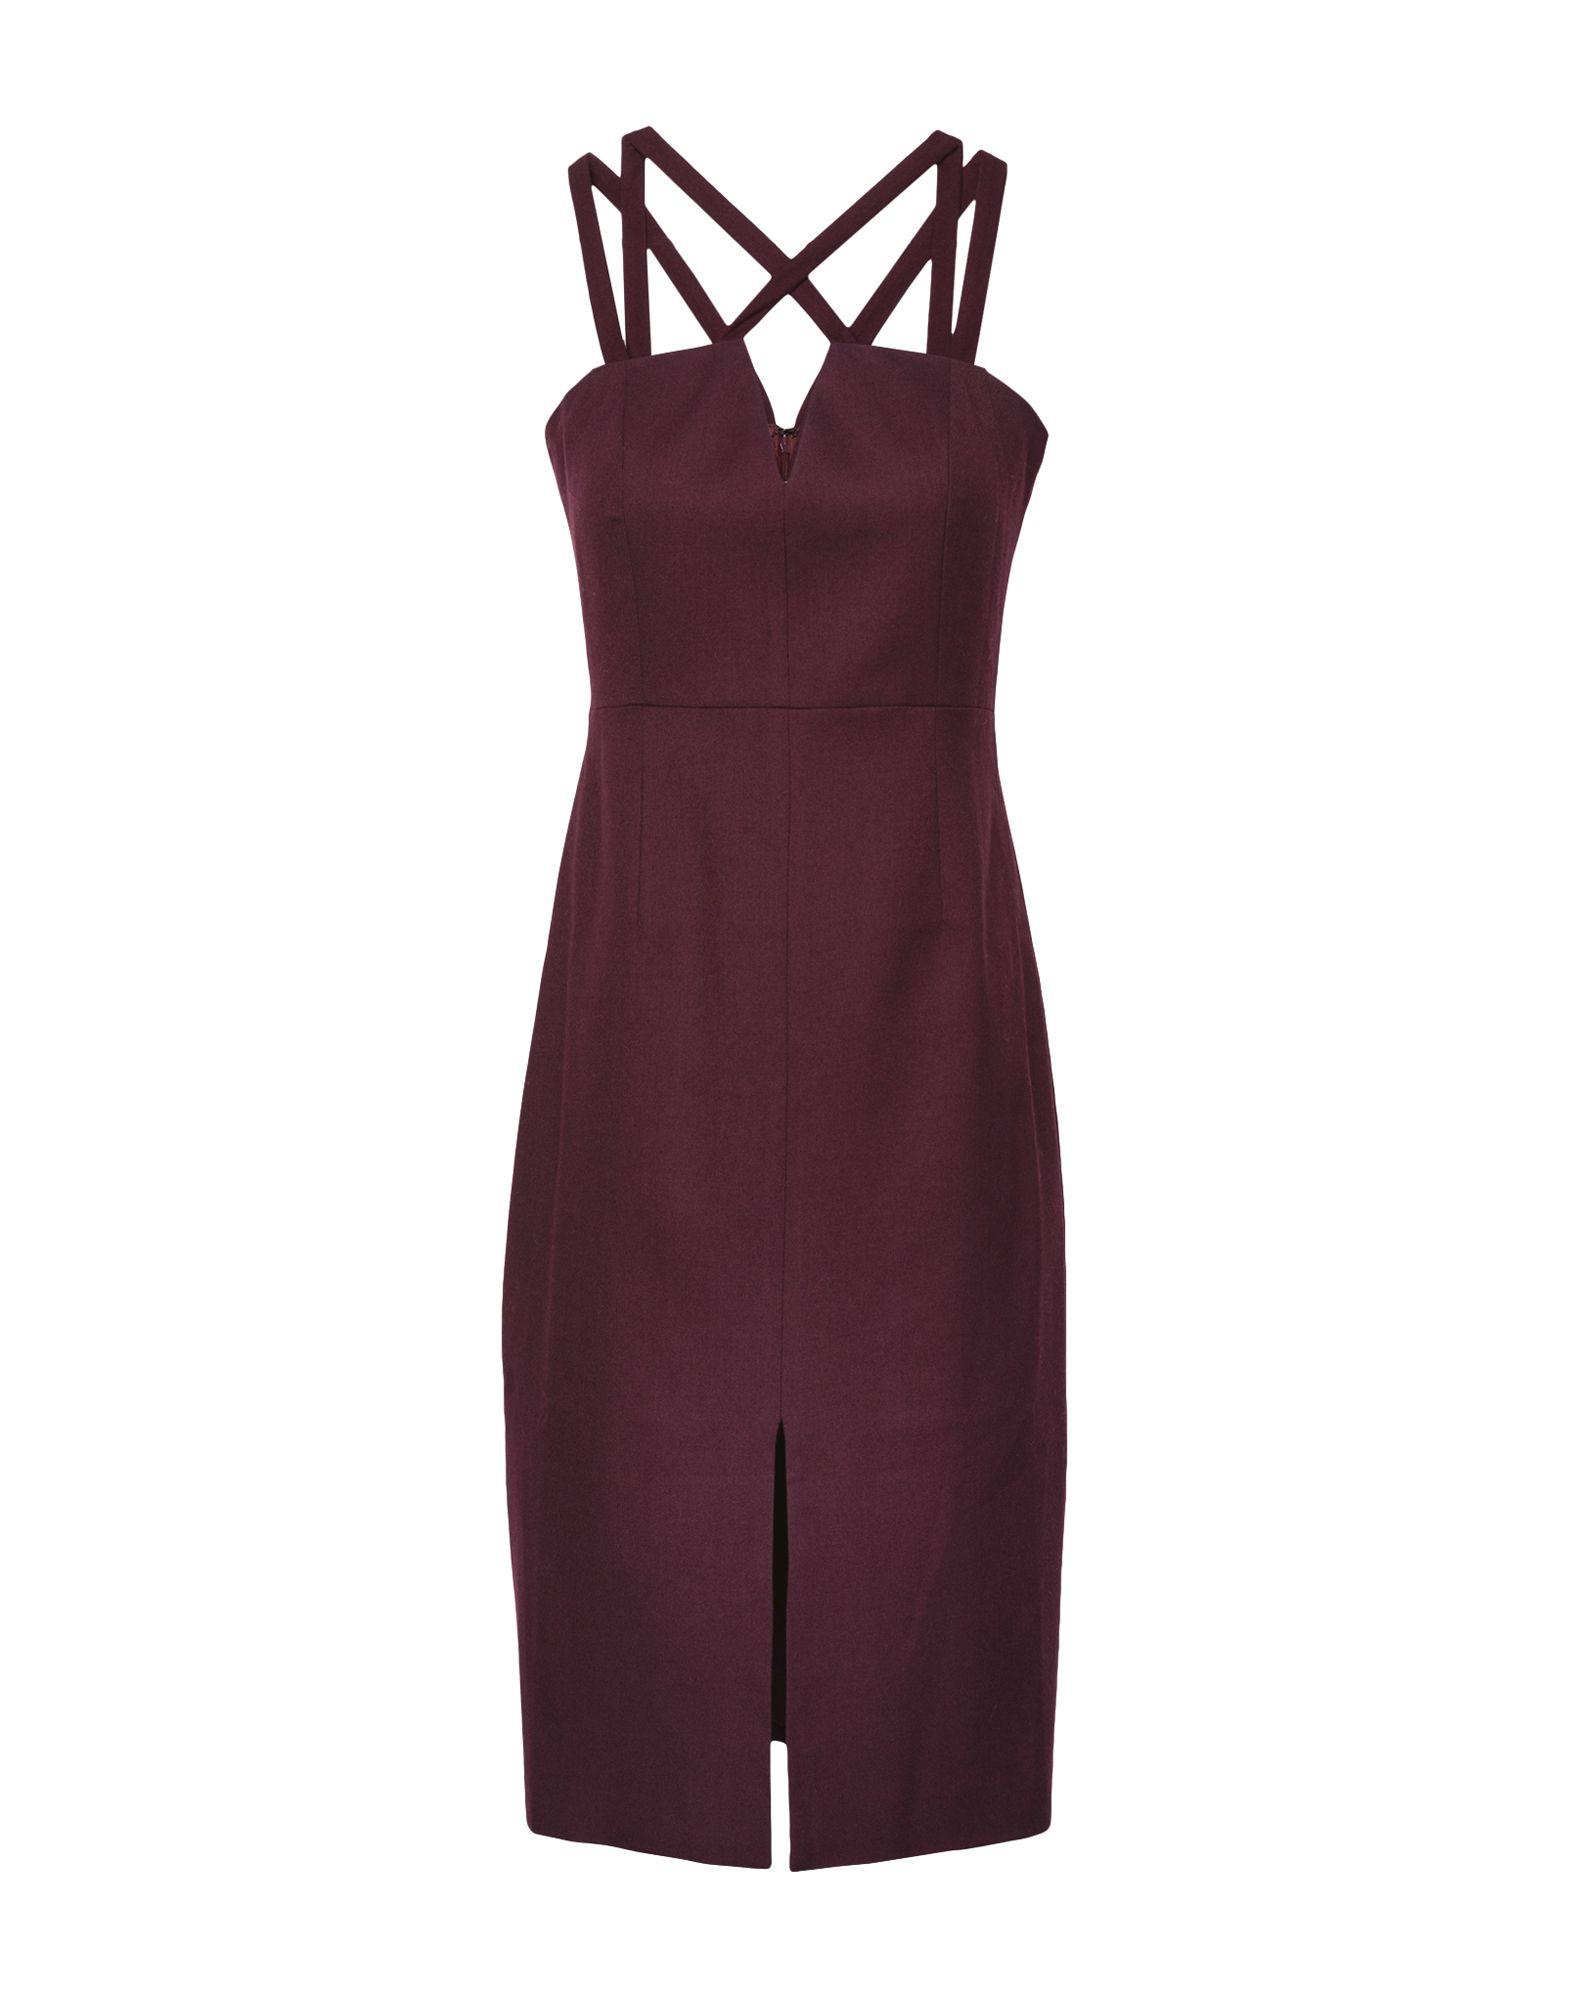 8 by YOOX Платье до колена коктейльное платье sun738